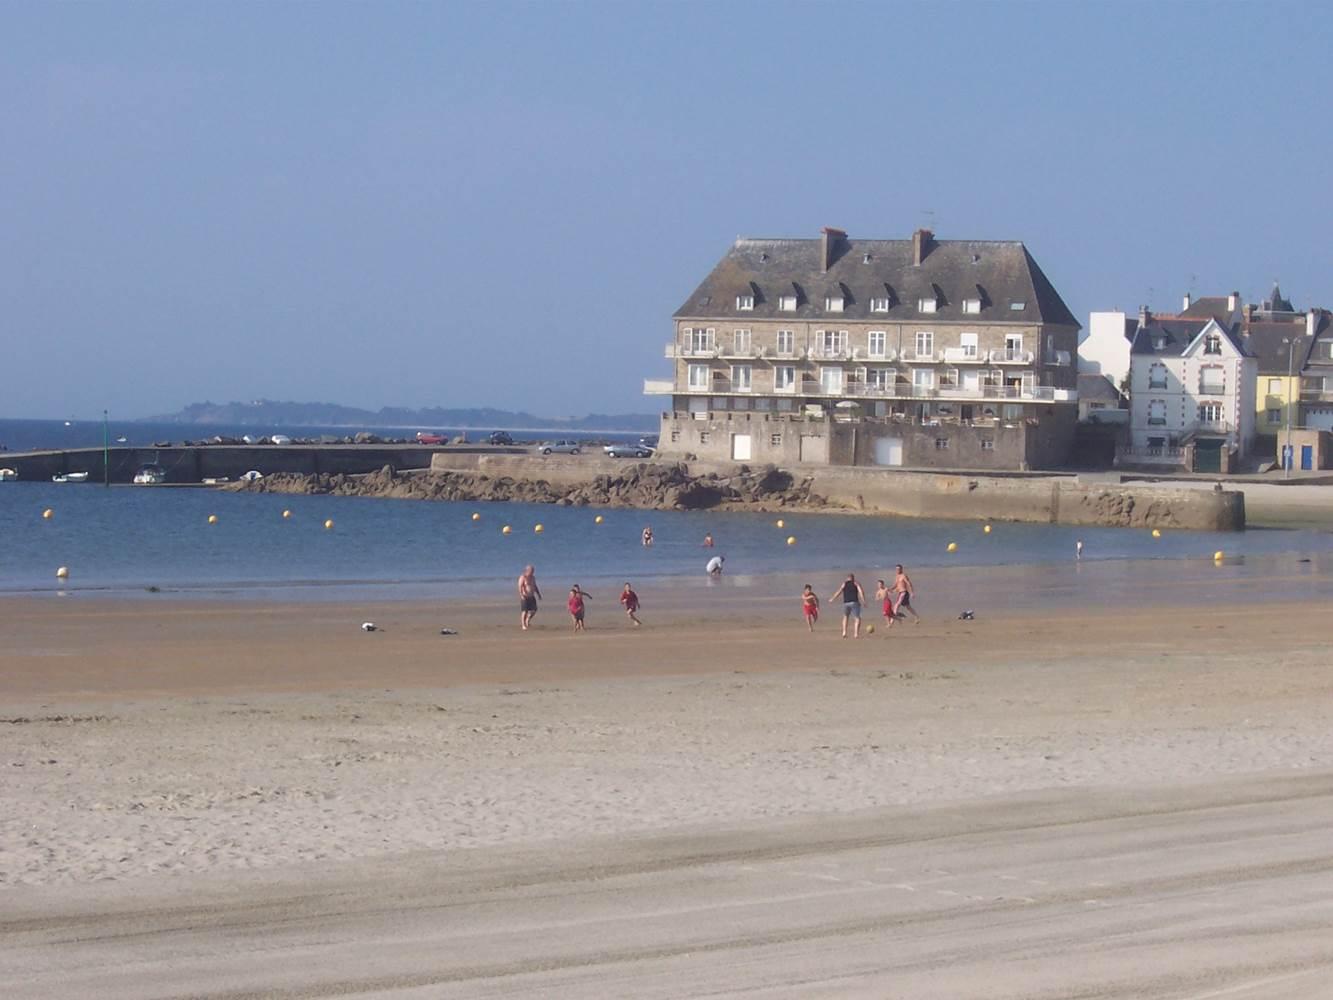 Plage-de-Toulhars-Larmor-Plage-Morbihan-Bretagne-Sud  ©